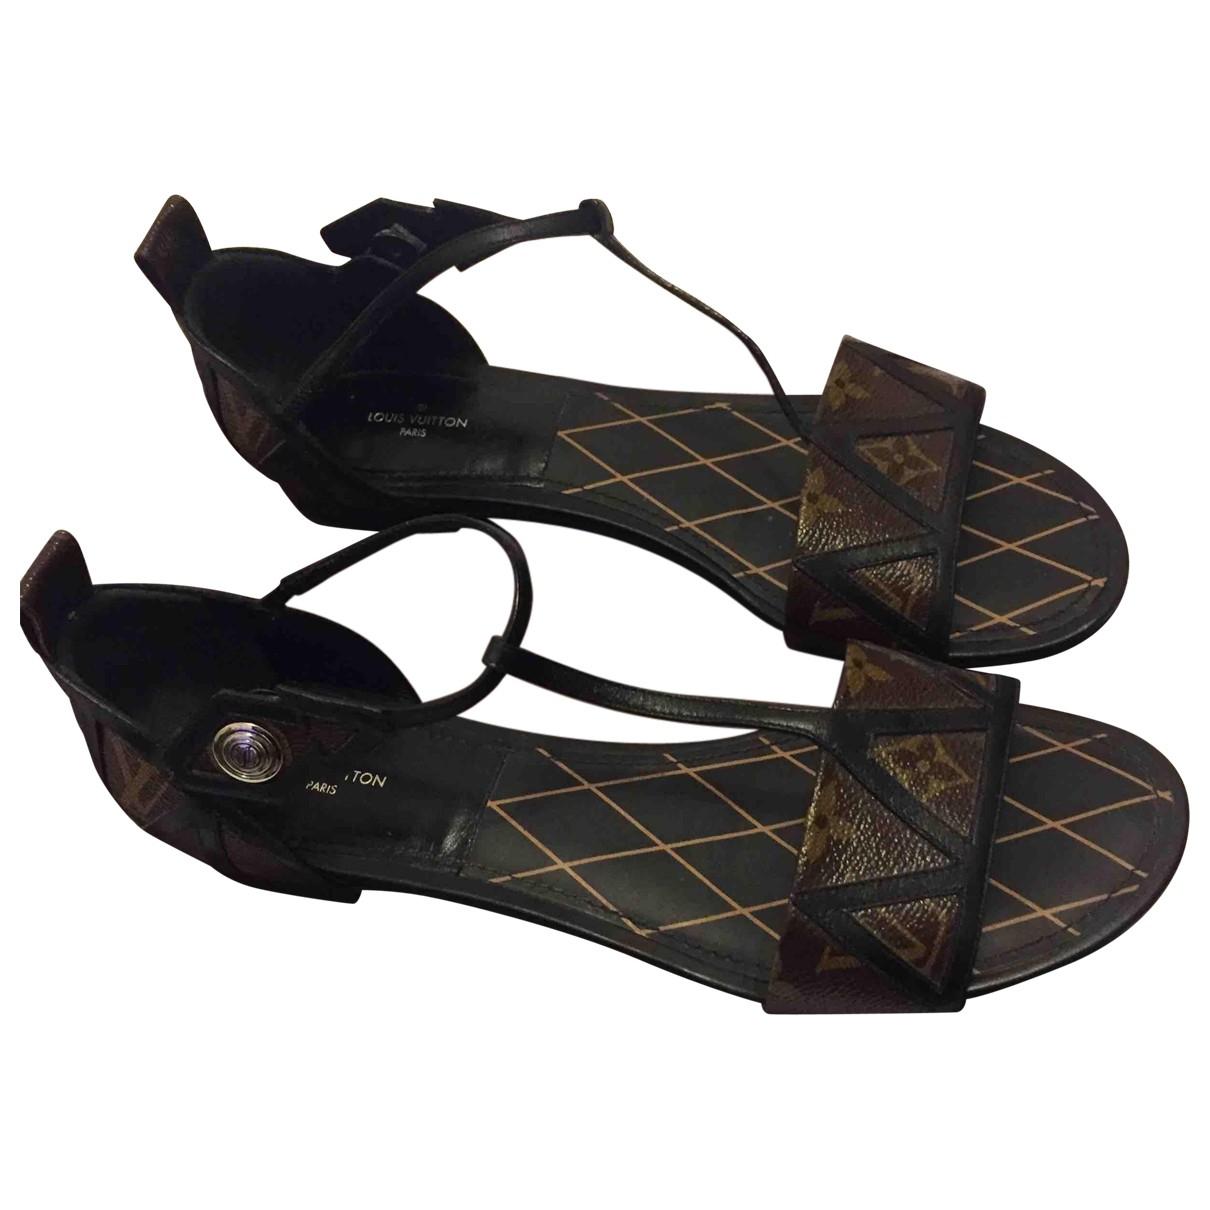 Louis Vuitton N Leather Sandals for Women 40 EU